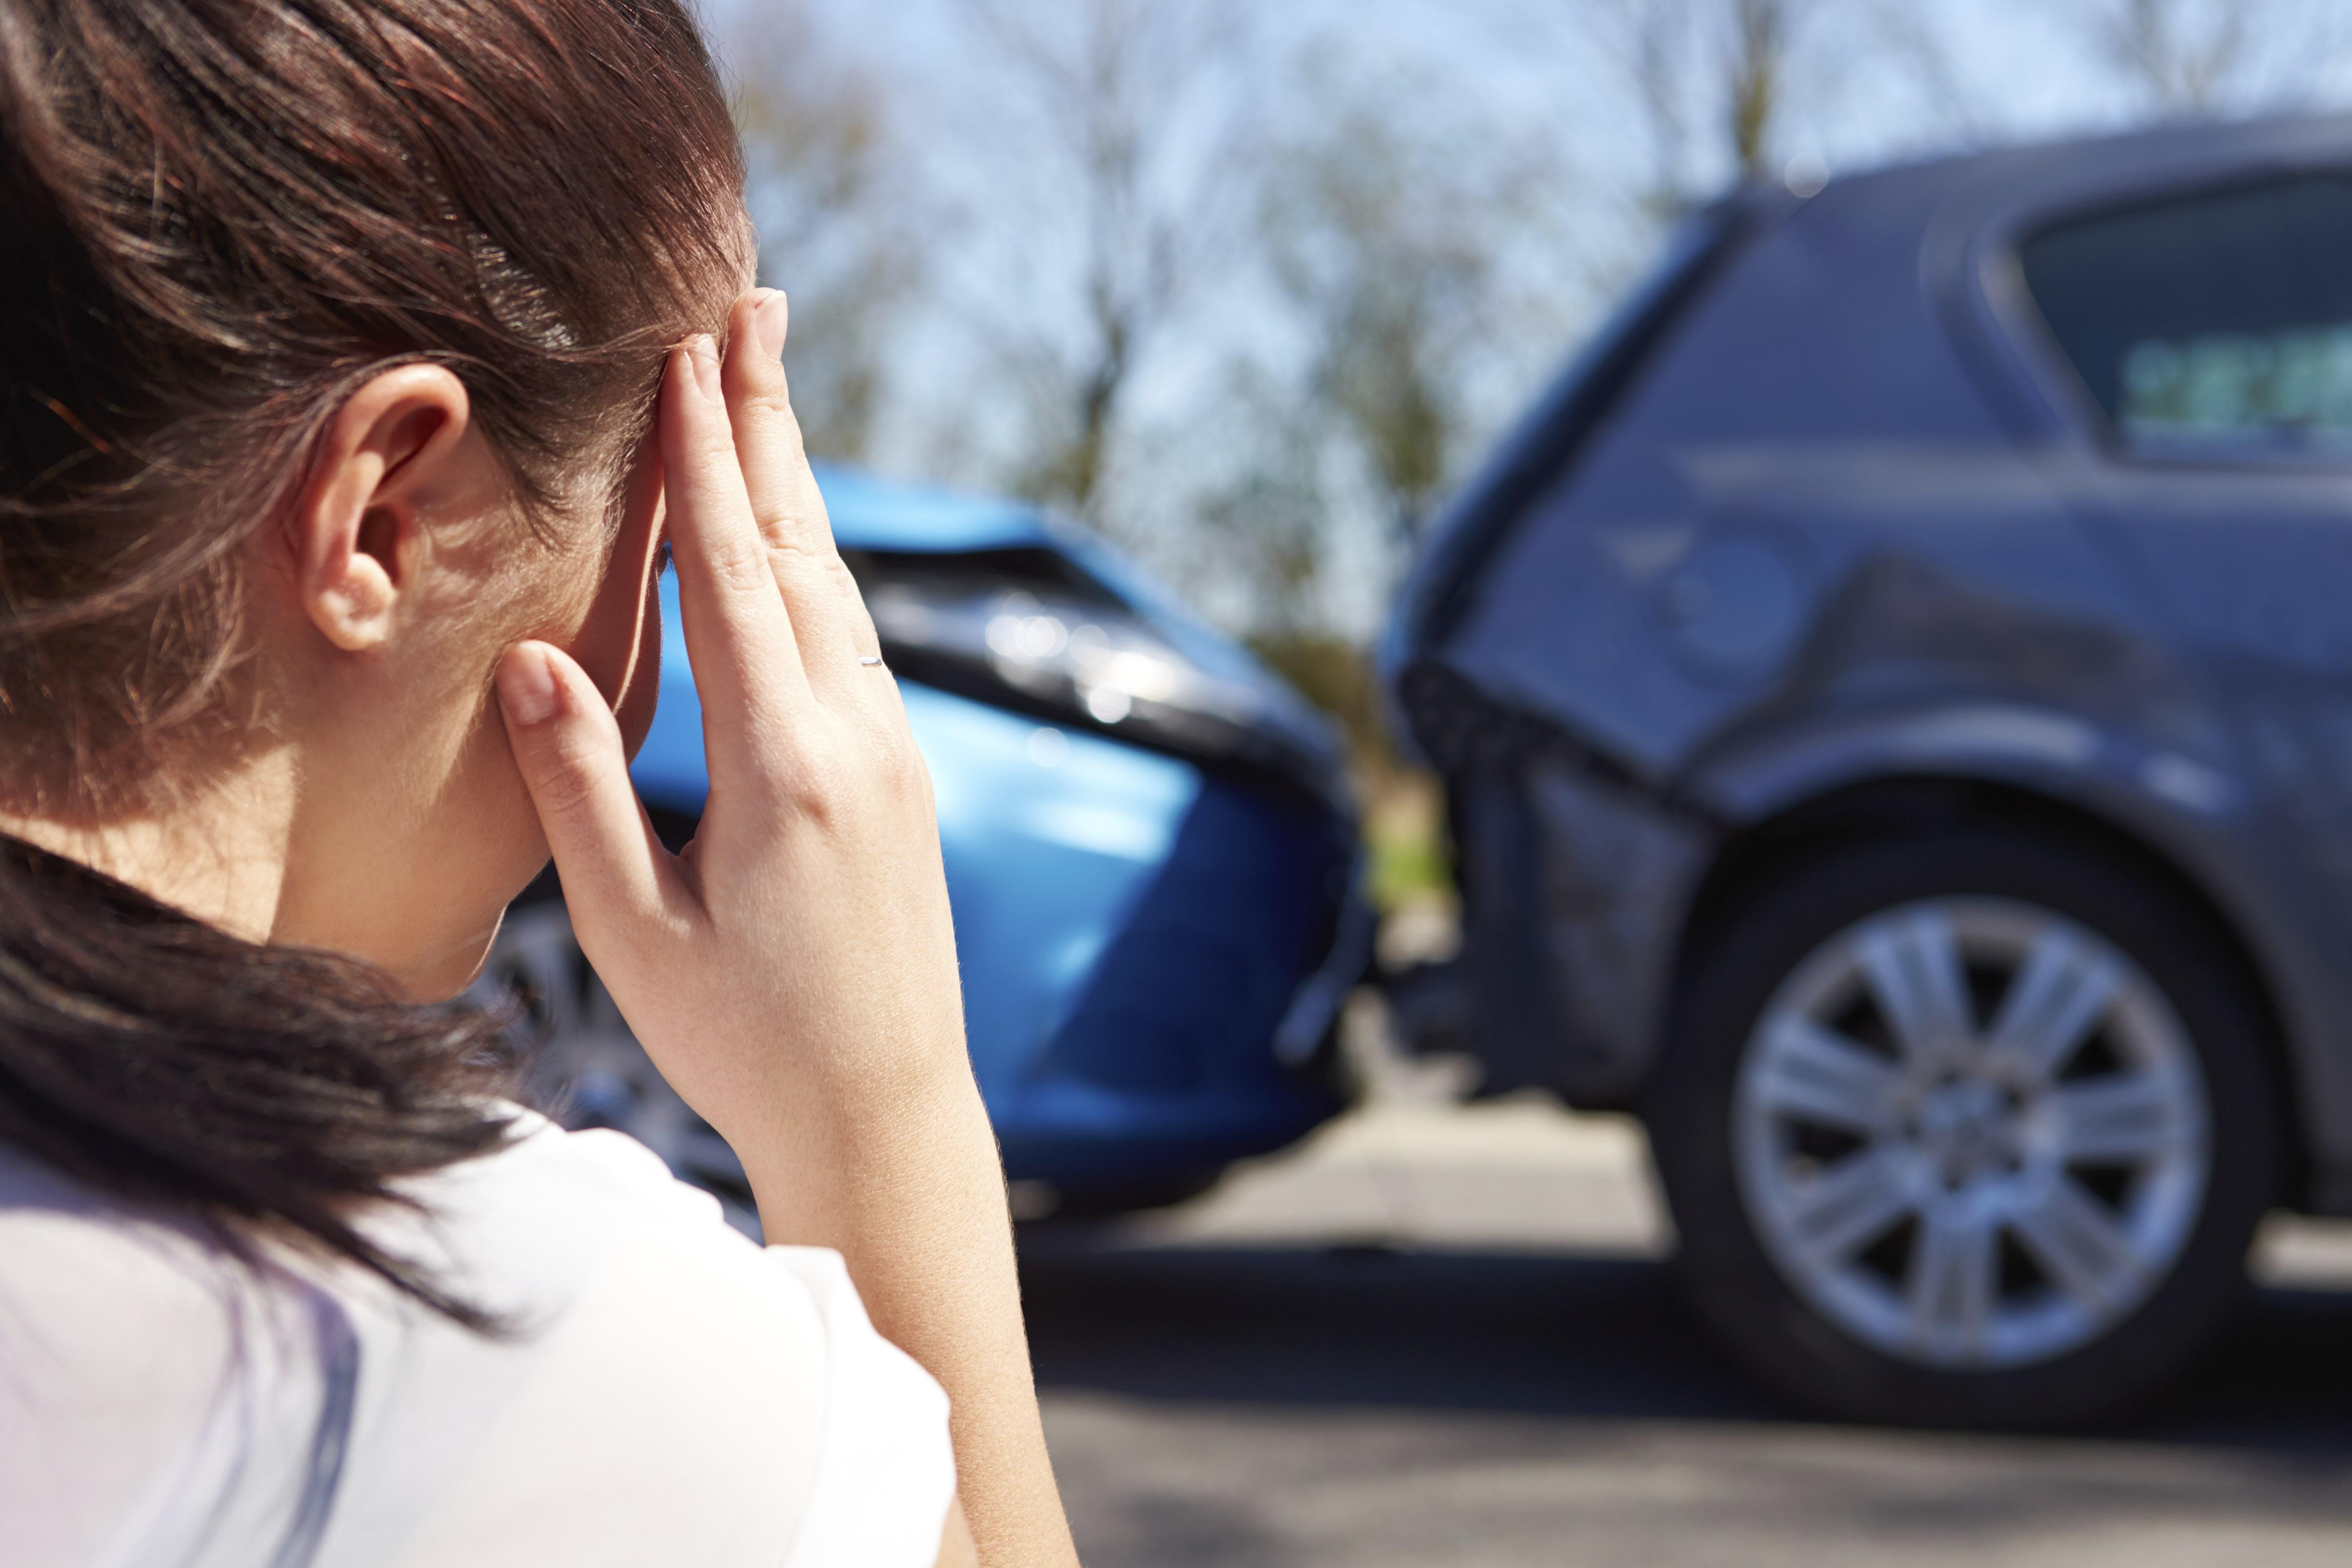 Louisiana car accident lawyer